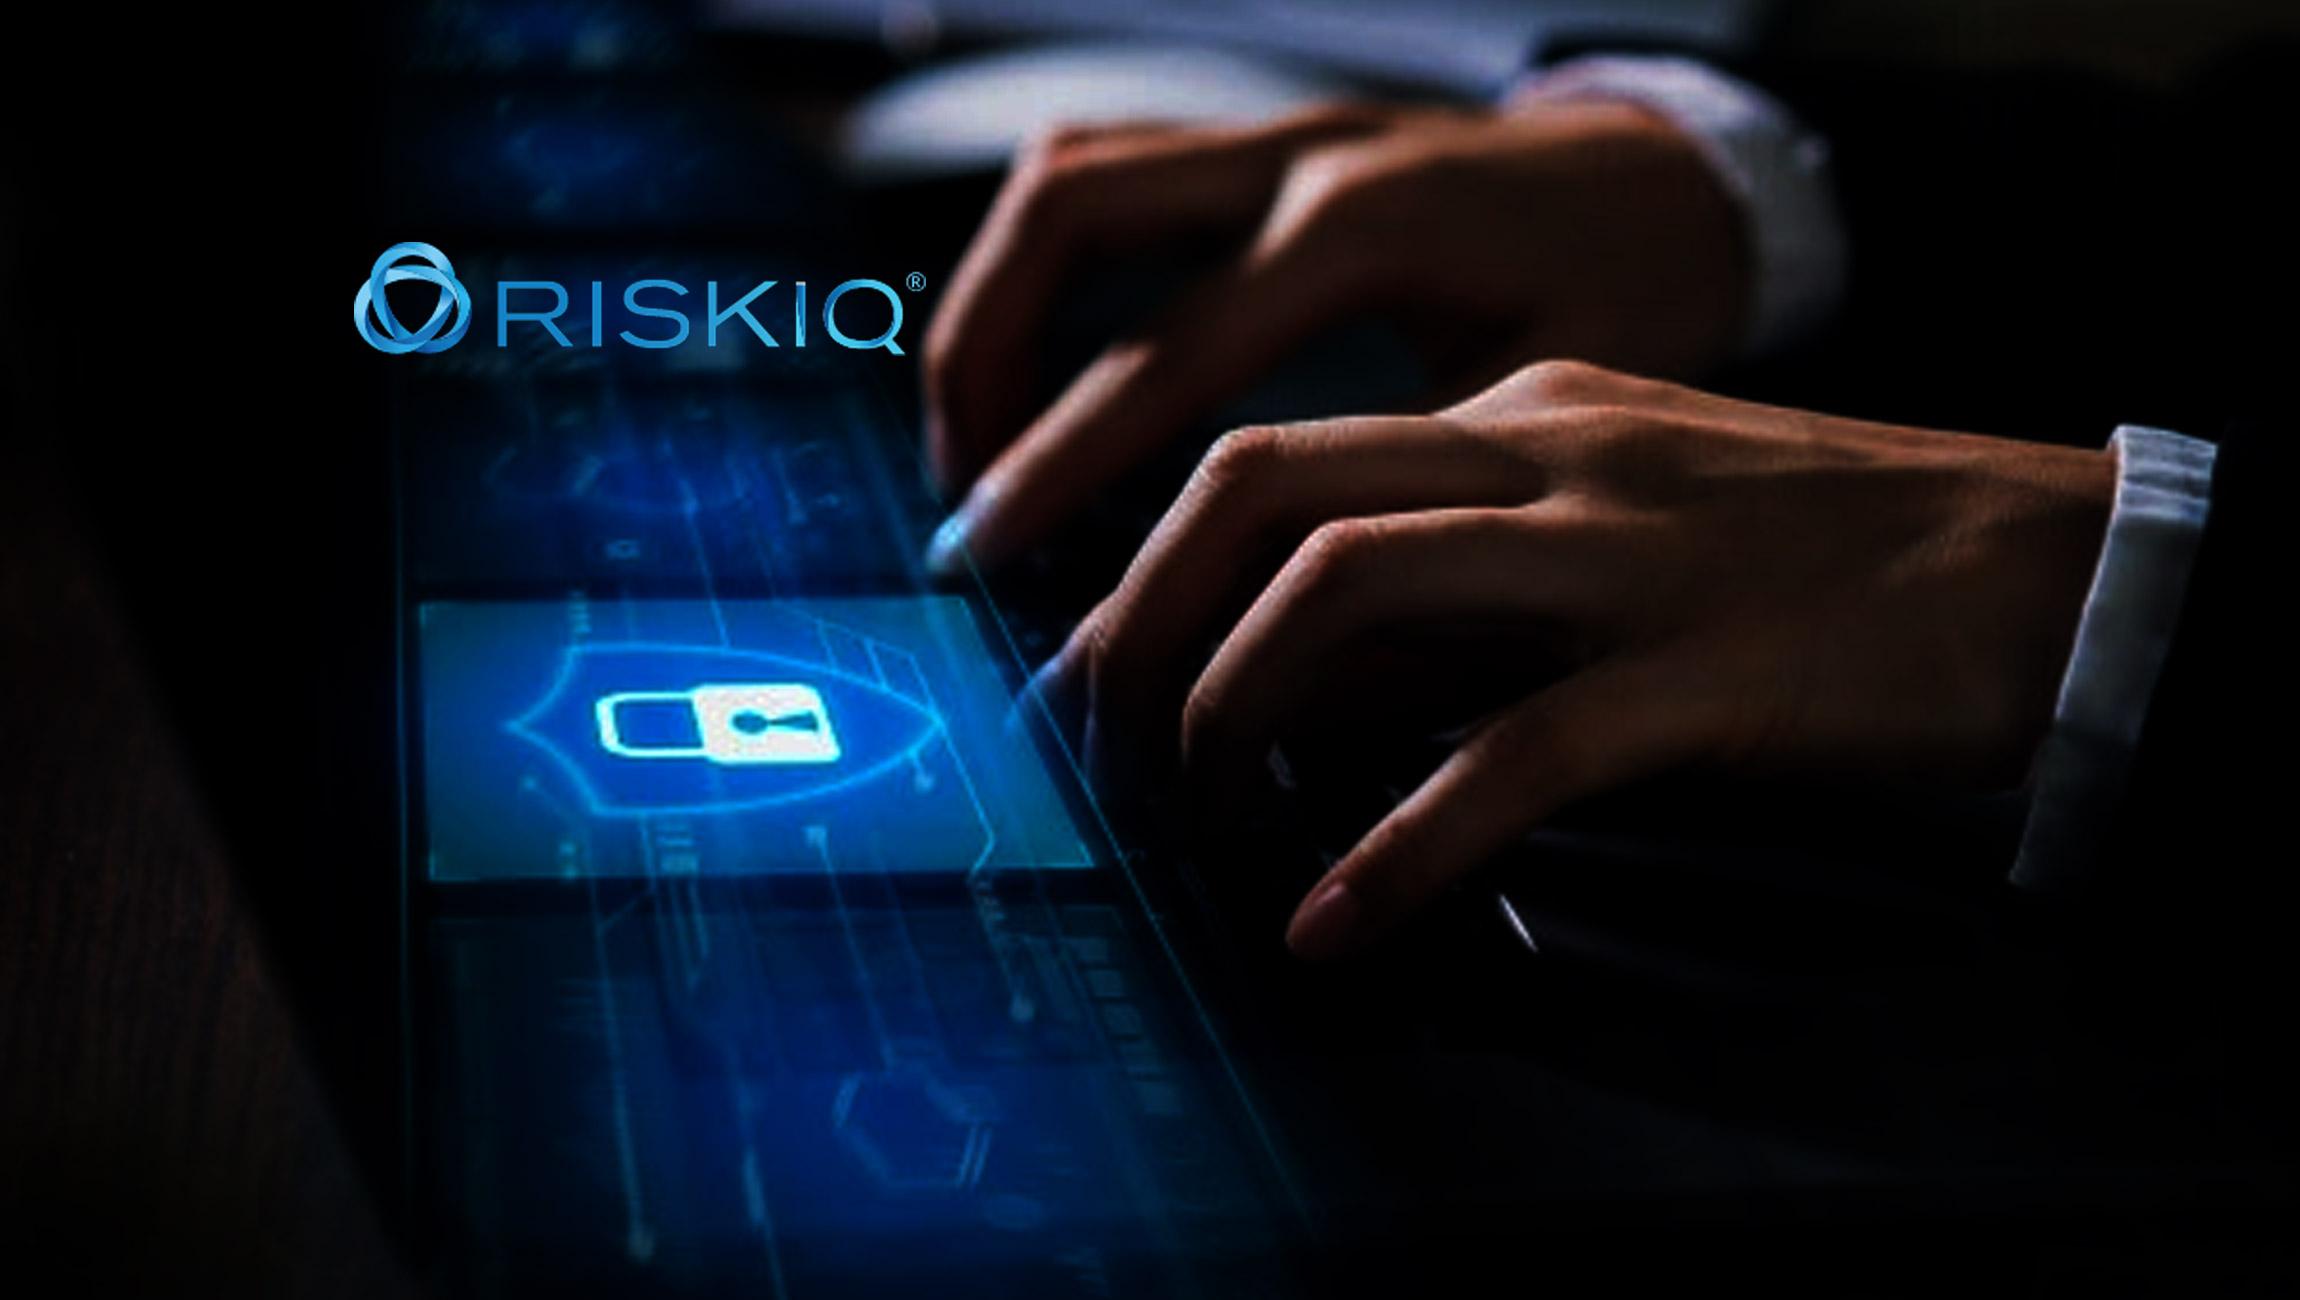 RiskIQ Announces its Illuminate® Internet Intelligence Platform Delivering Tailored Security Intelligence By Lighting Up Internet Relationships